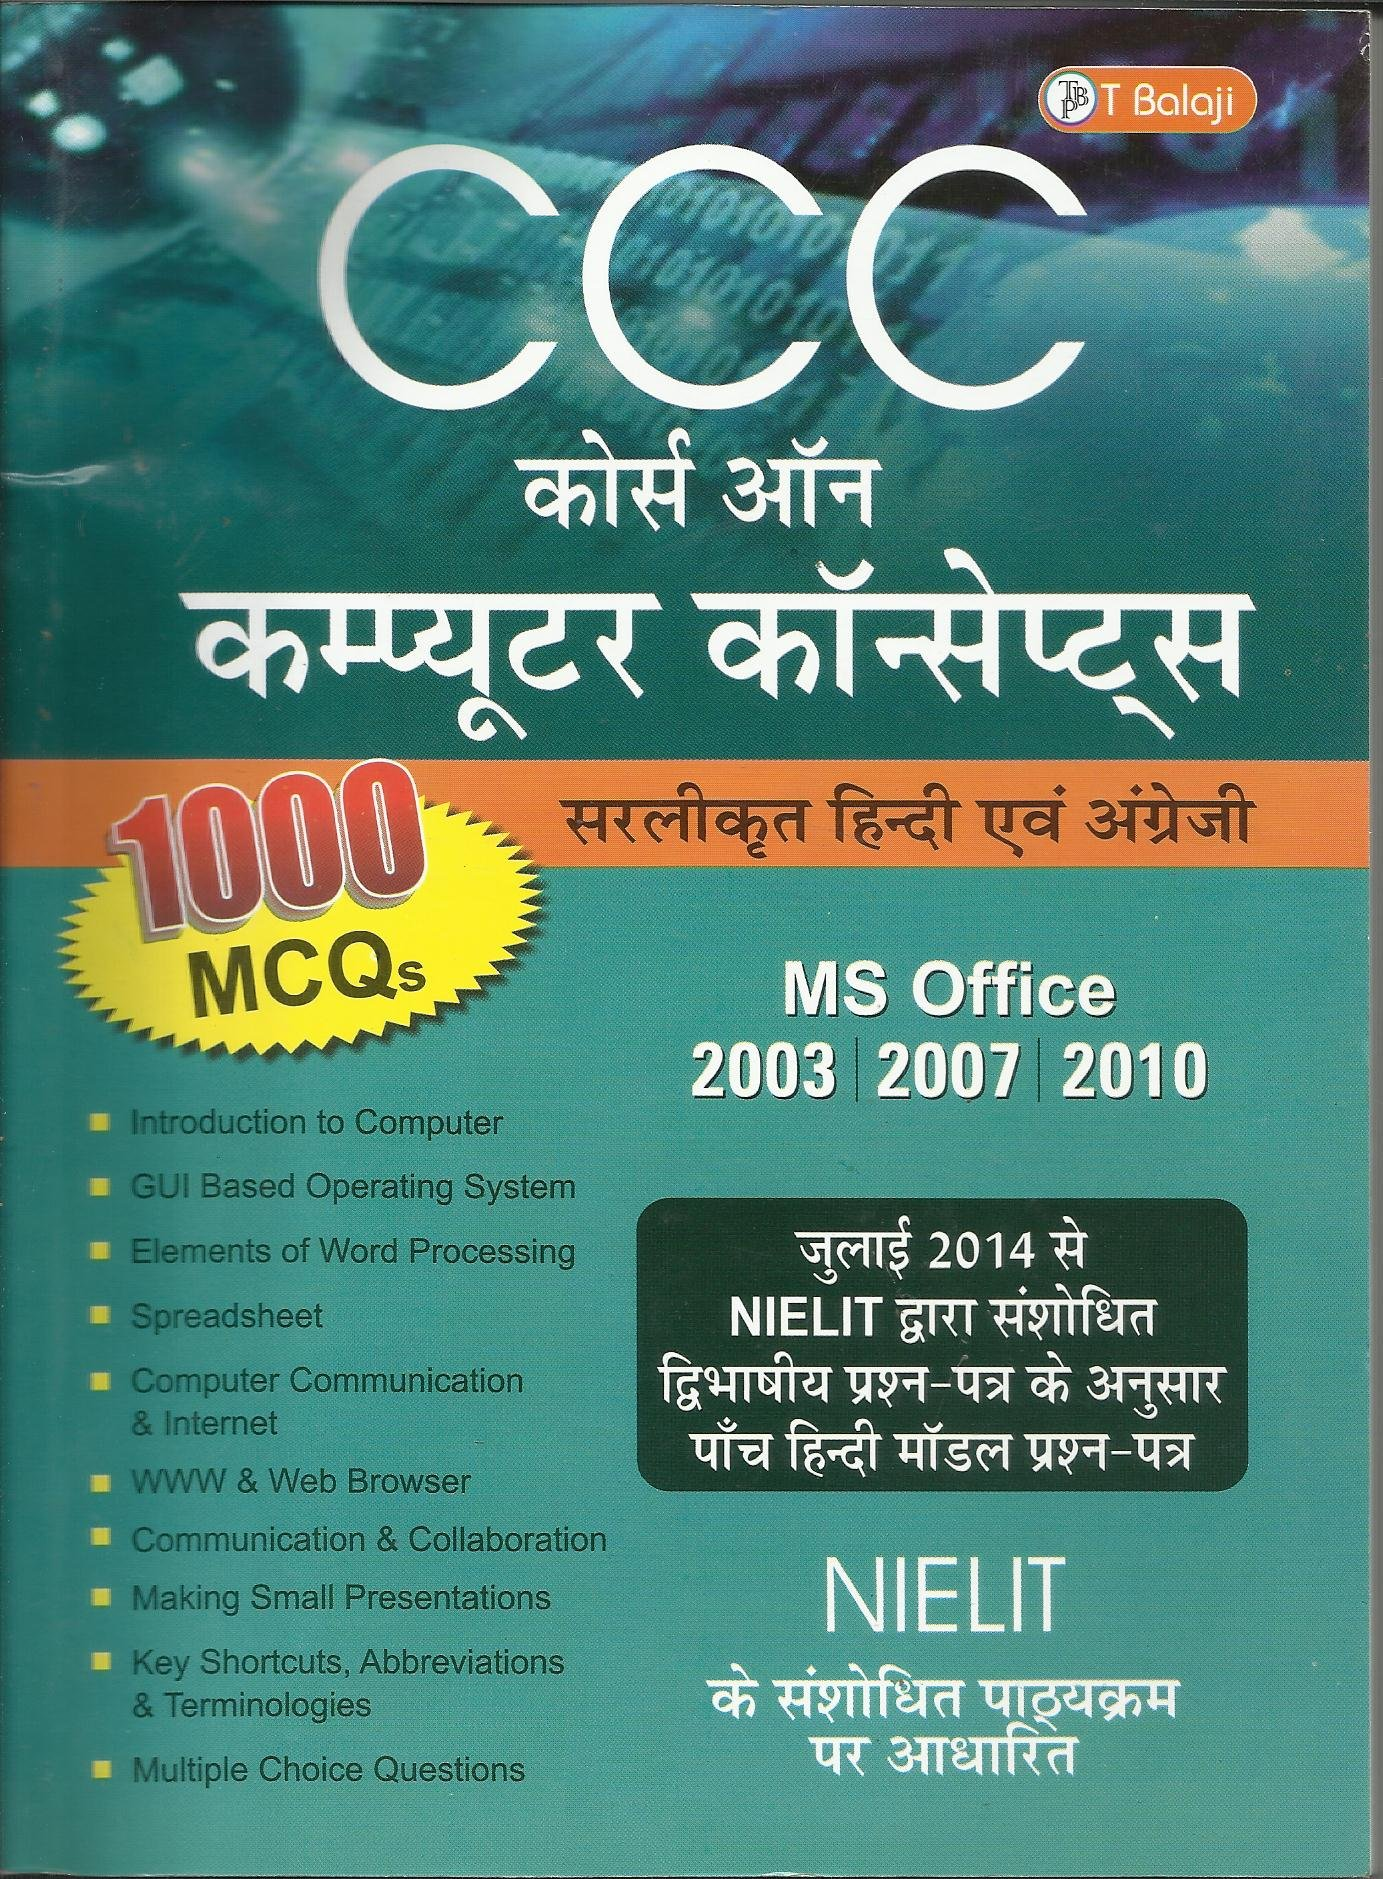 Ccc Study Material Pdf In Hindi